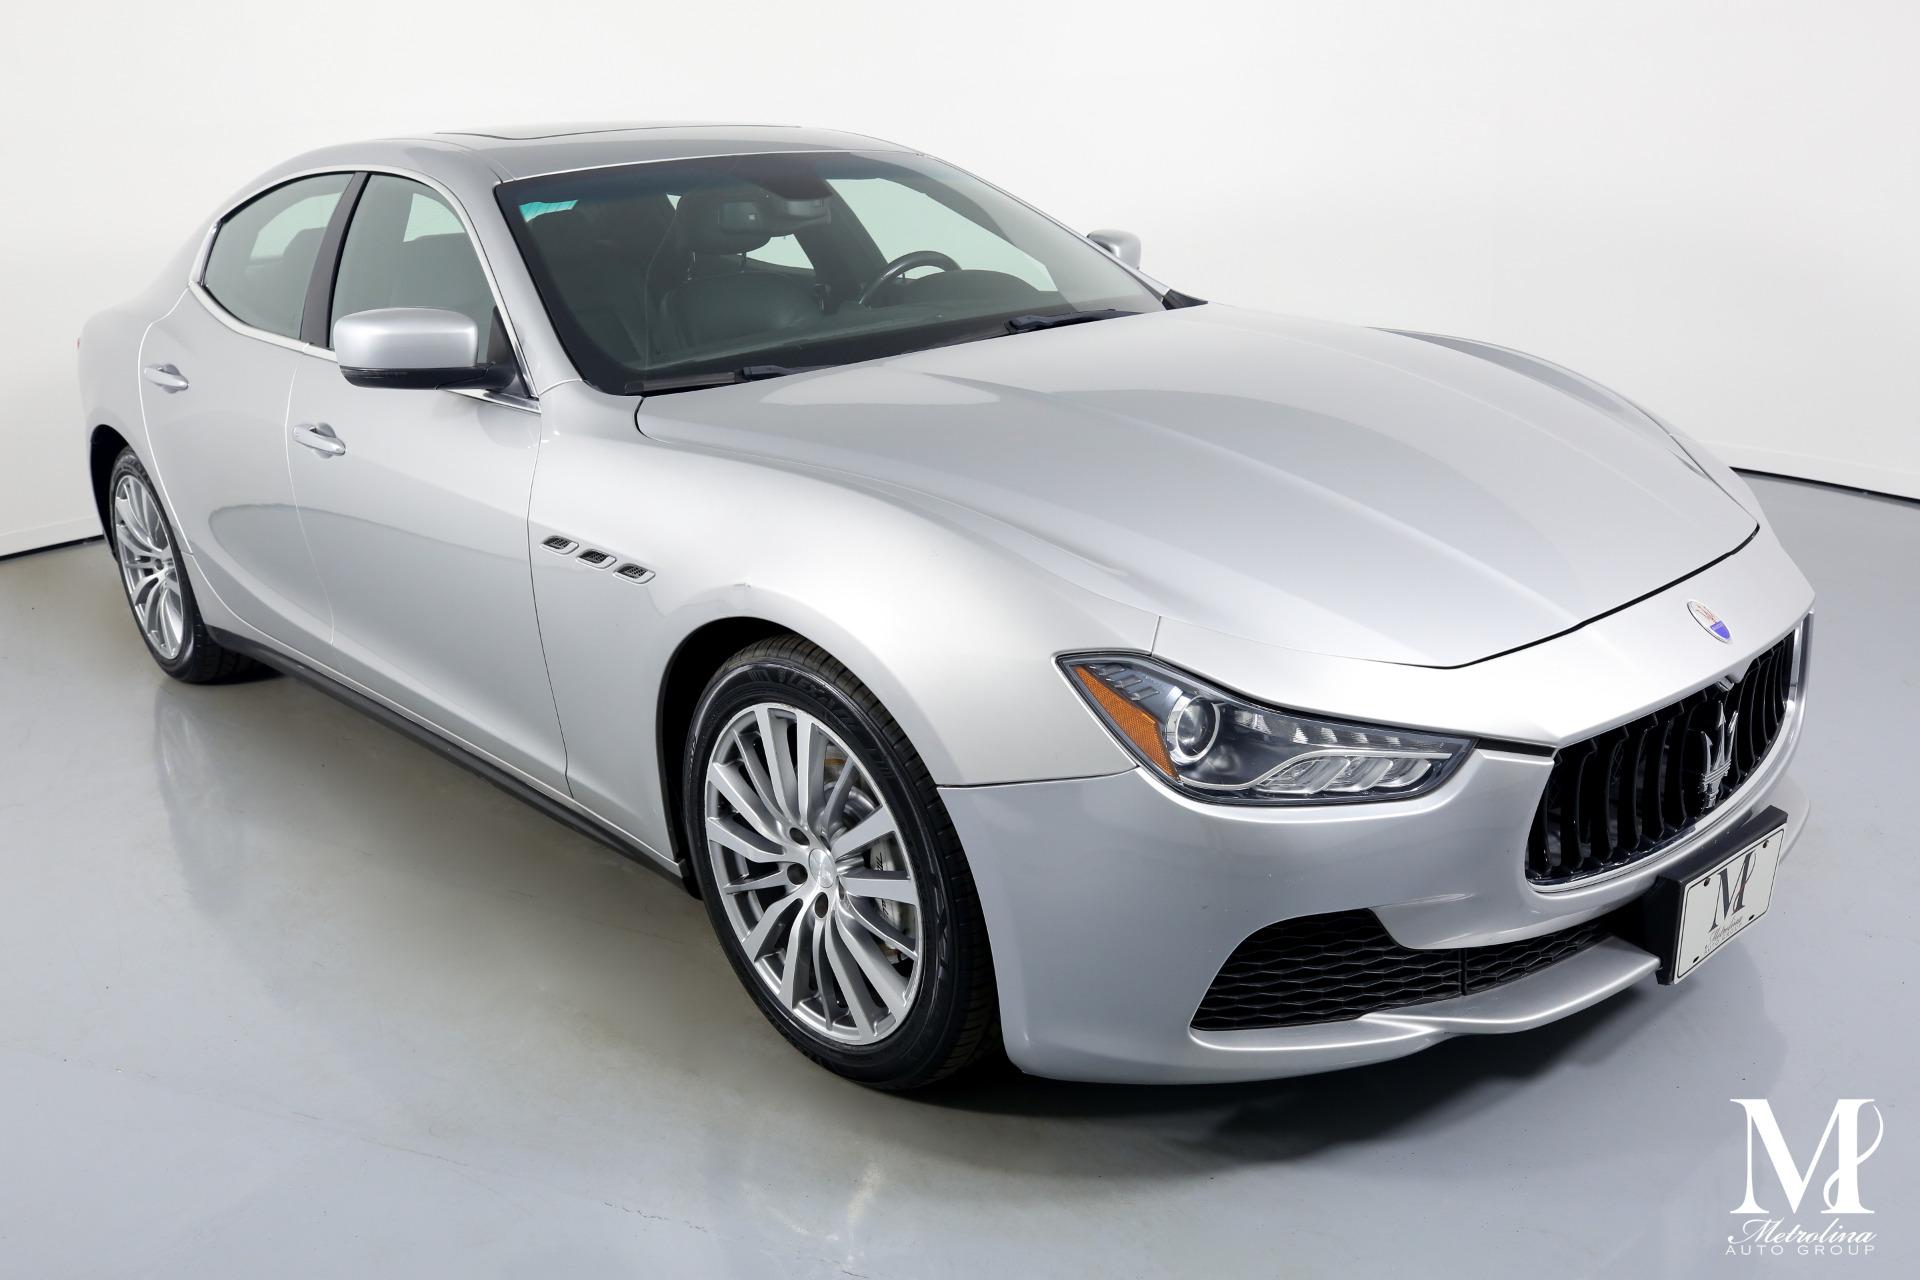 Used 2014 Maserati Ghibli for sale $25,996 at Metrolina Auto Group in Charlotte NC 28217 - 2